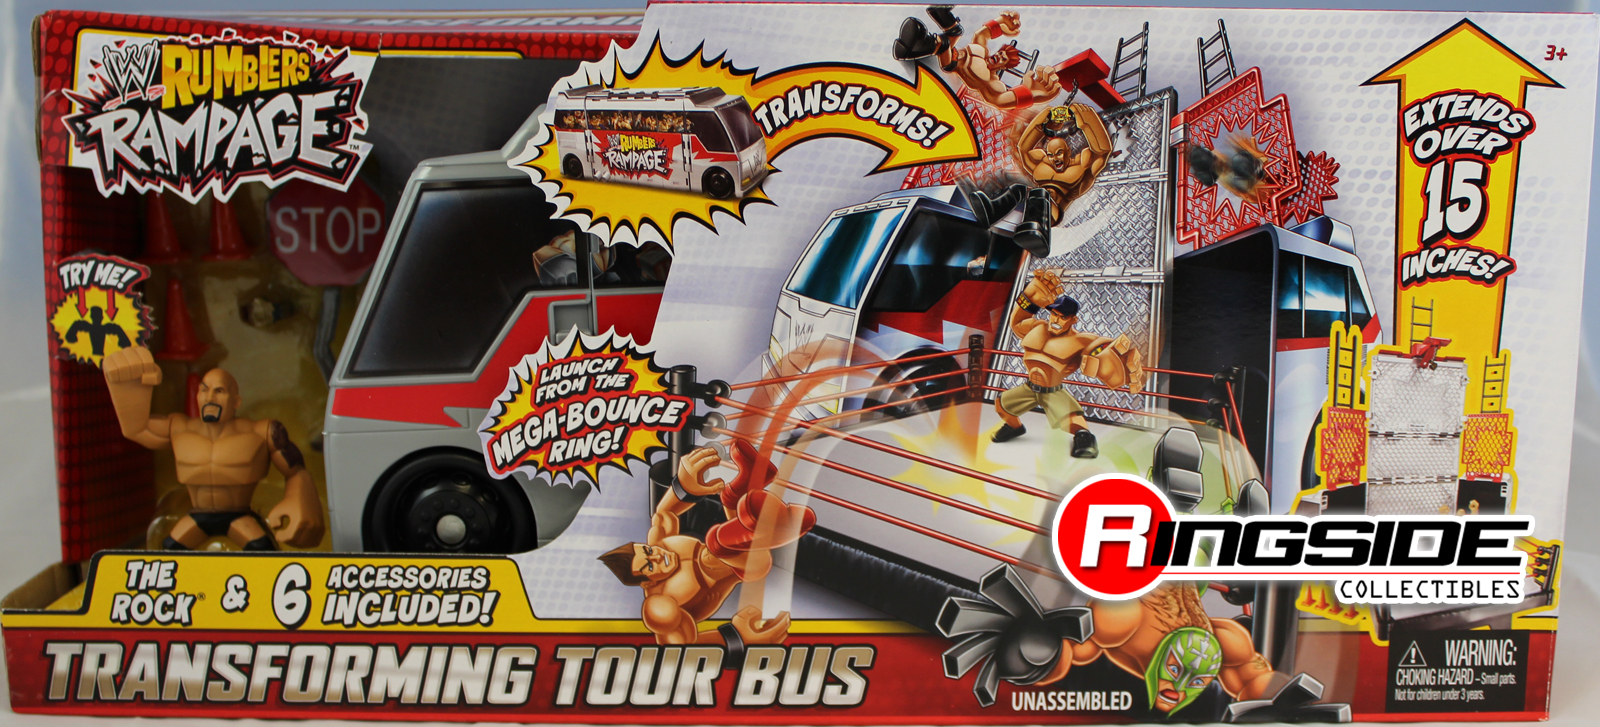 WWE Transforming Tour Bus W The Rock Rumblers Rampage